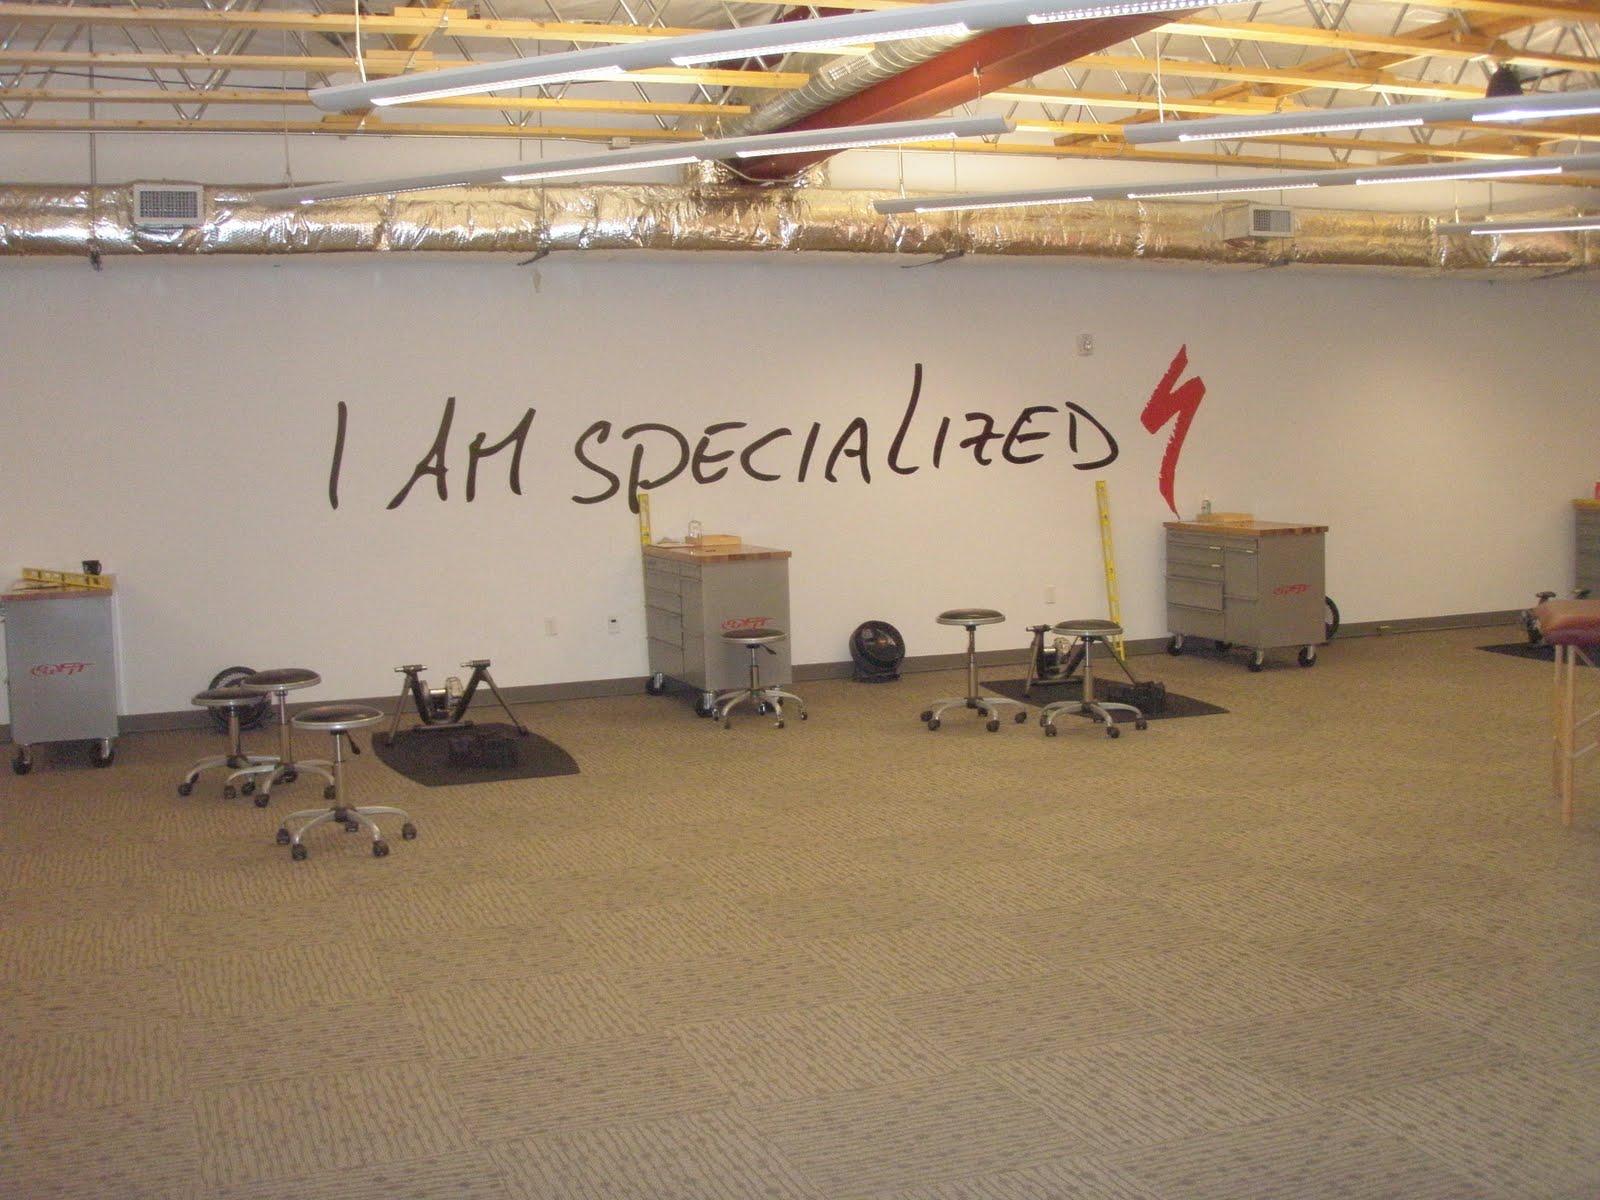 I Am Specialized Wallpaper | www.pixshark.com - Images ...